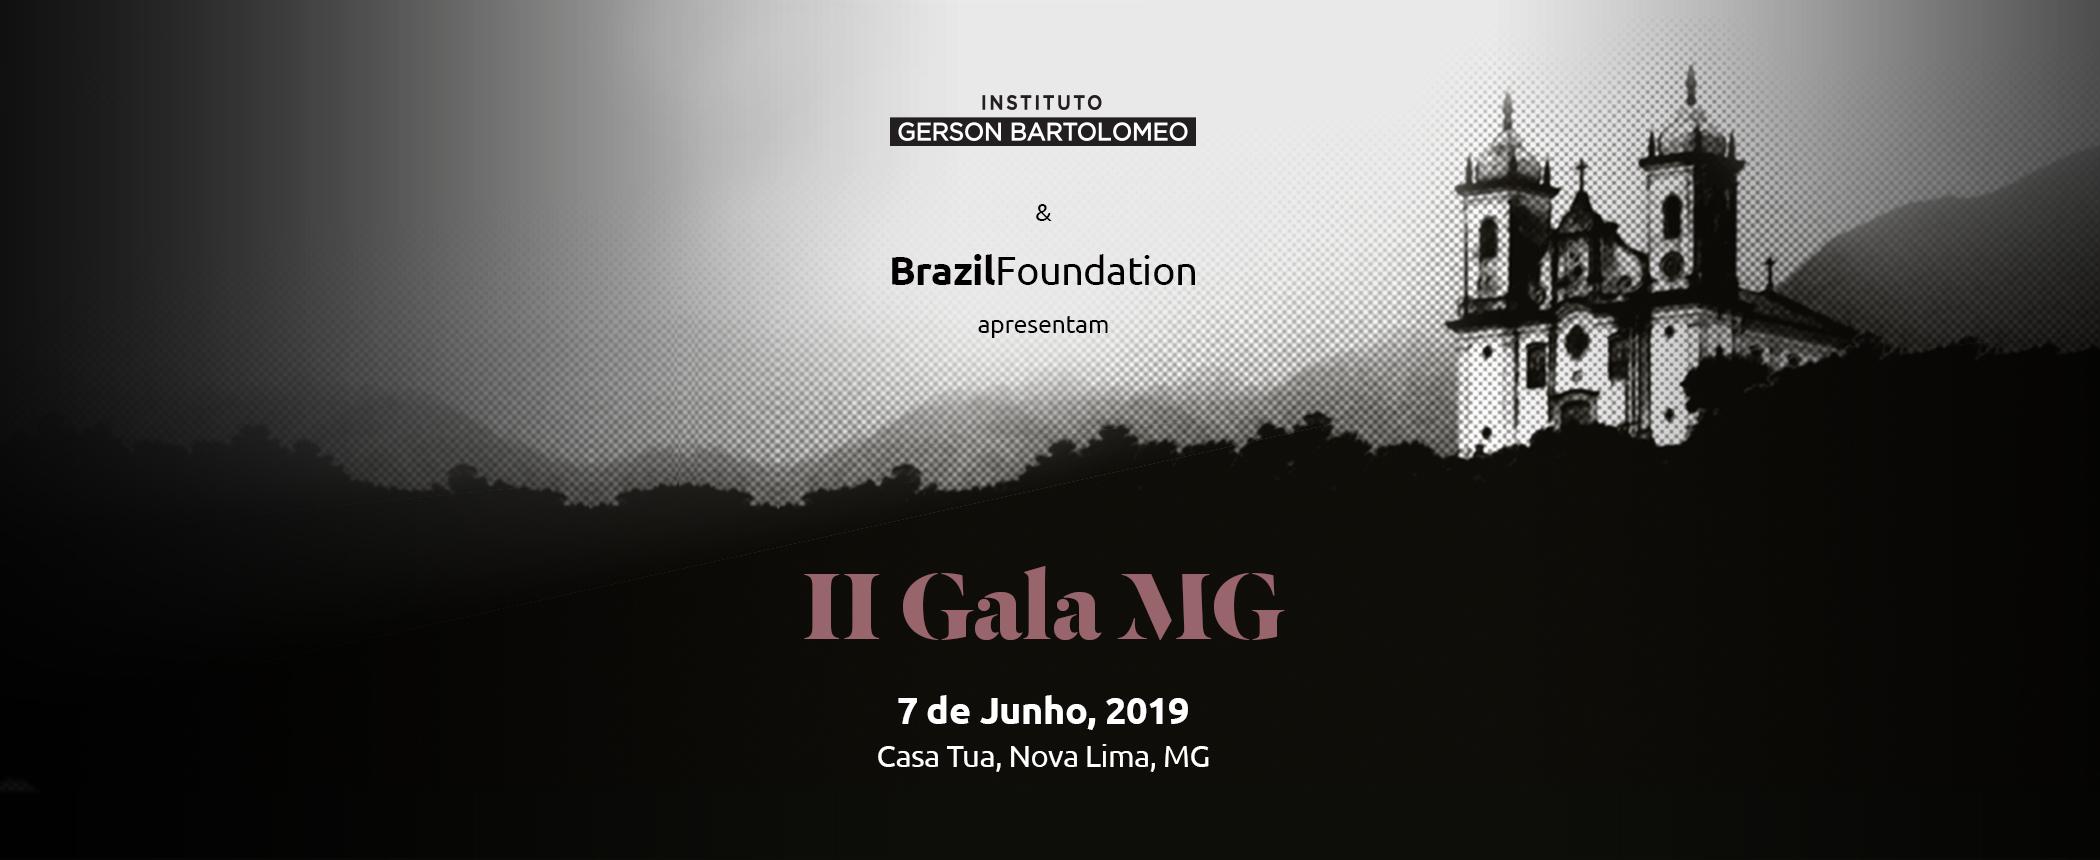 II Gala MG 2019 BrazilFoundation Minas Gerais Belo Horizonte Filantropia Philanthropy Casa Tua